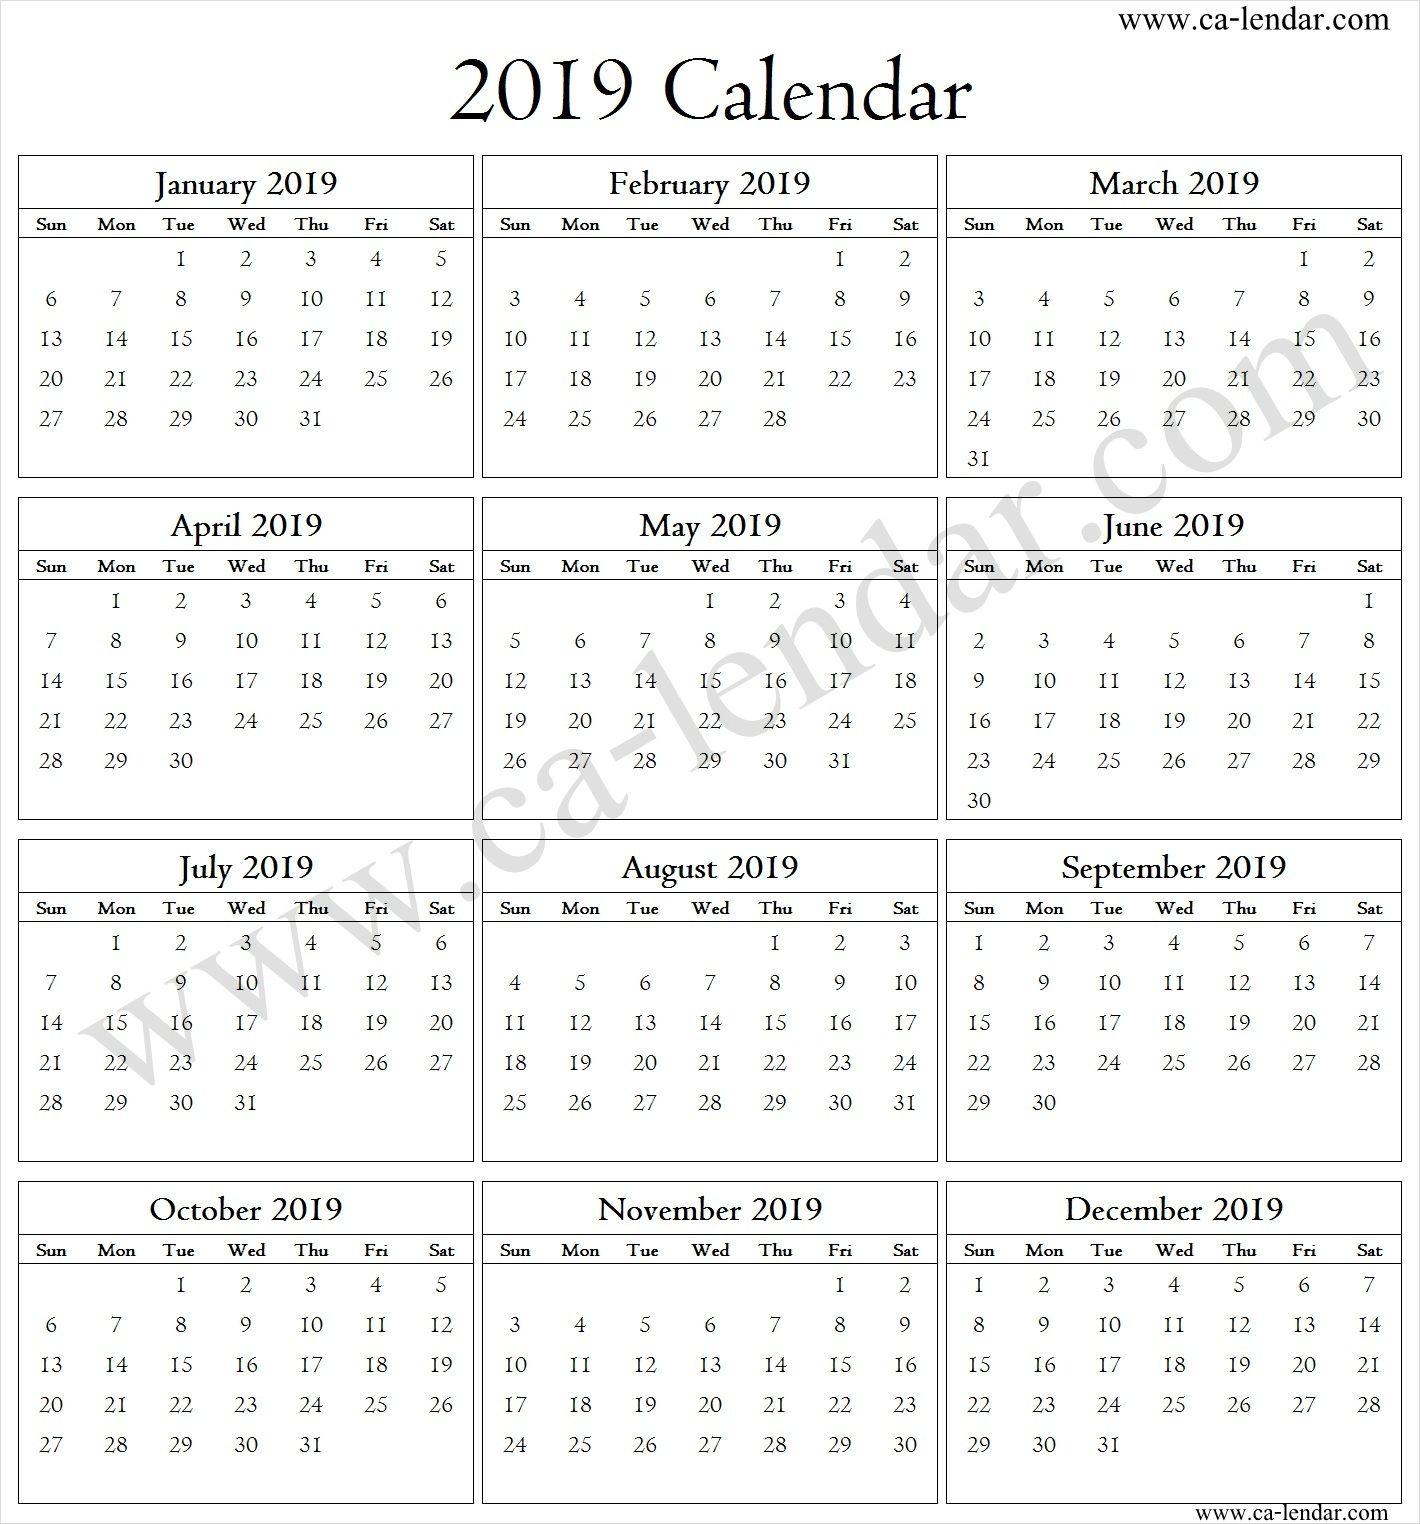 Blank 2019 Calendar Template Calendar 2019 Template Calendar